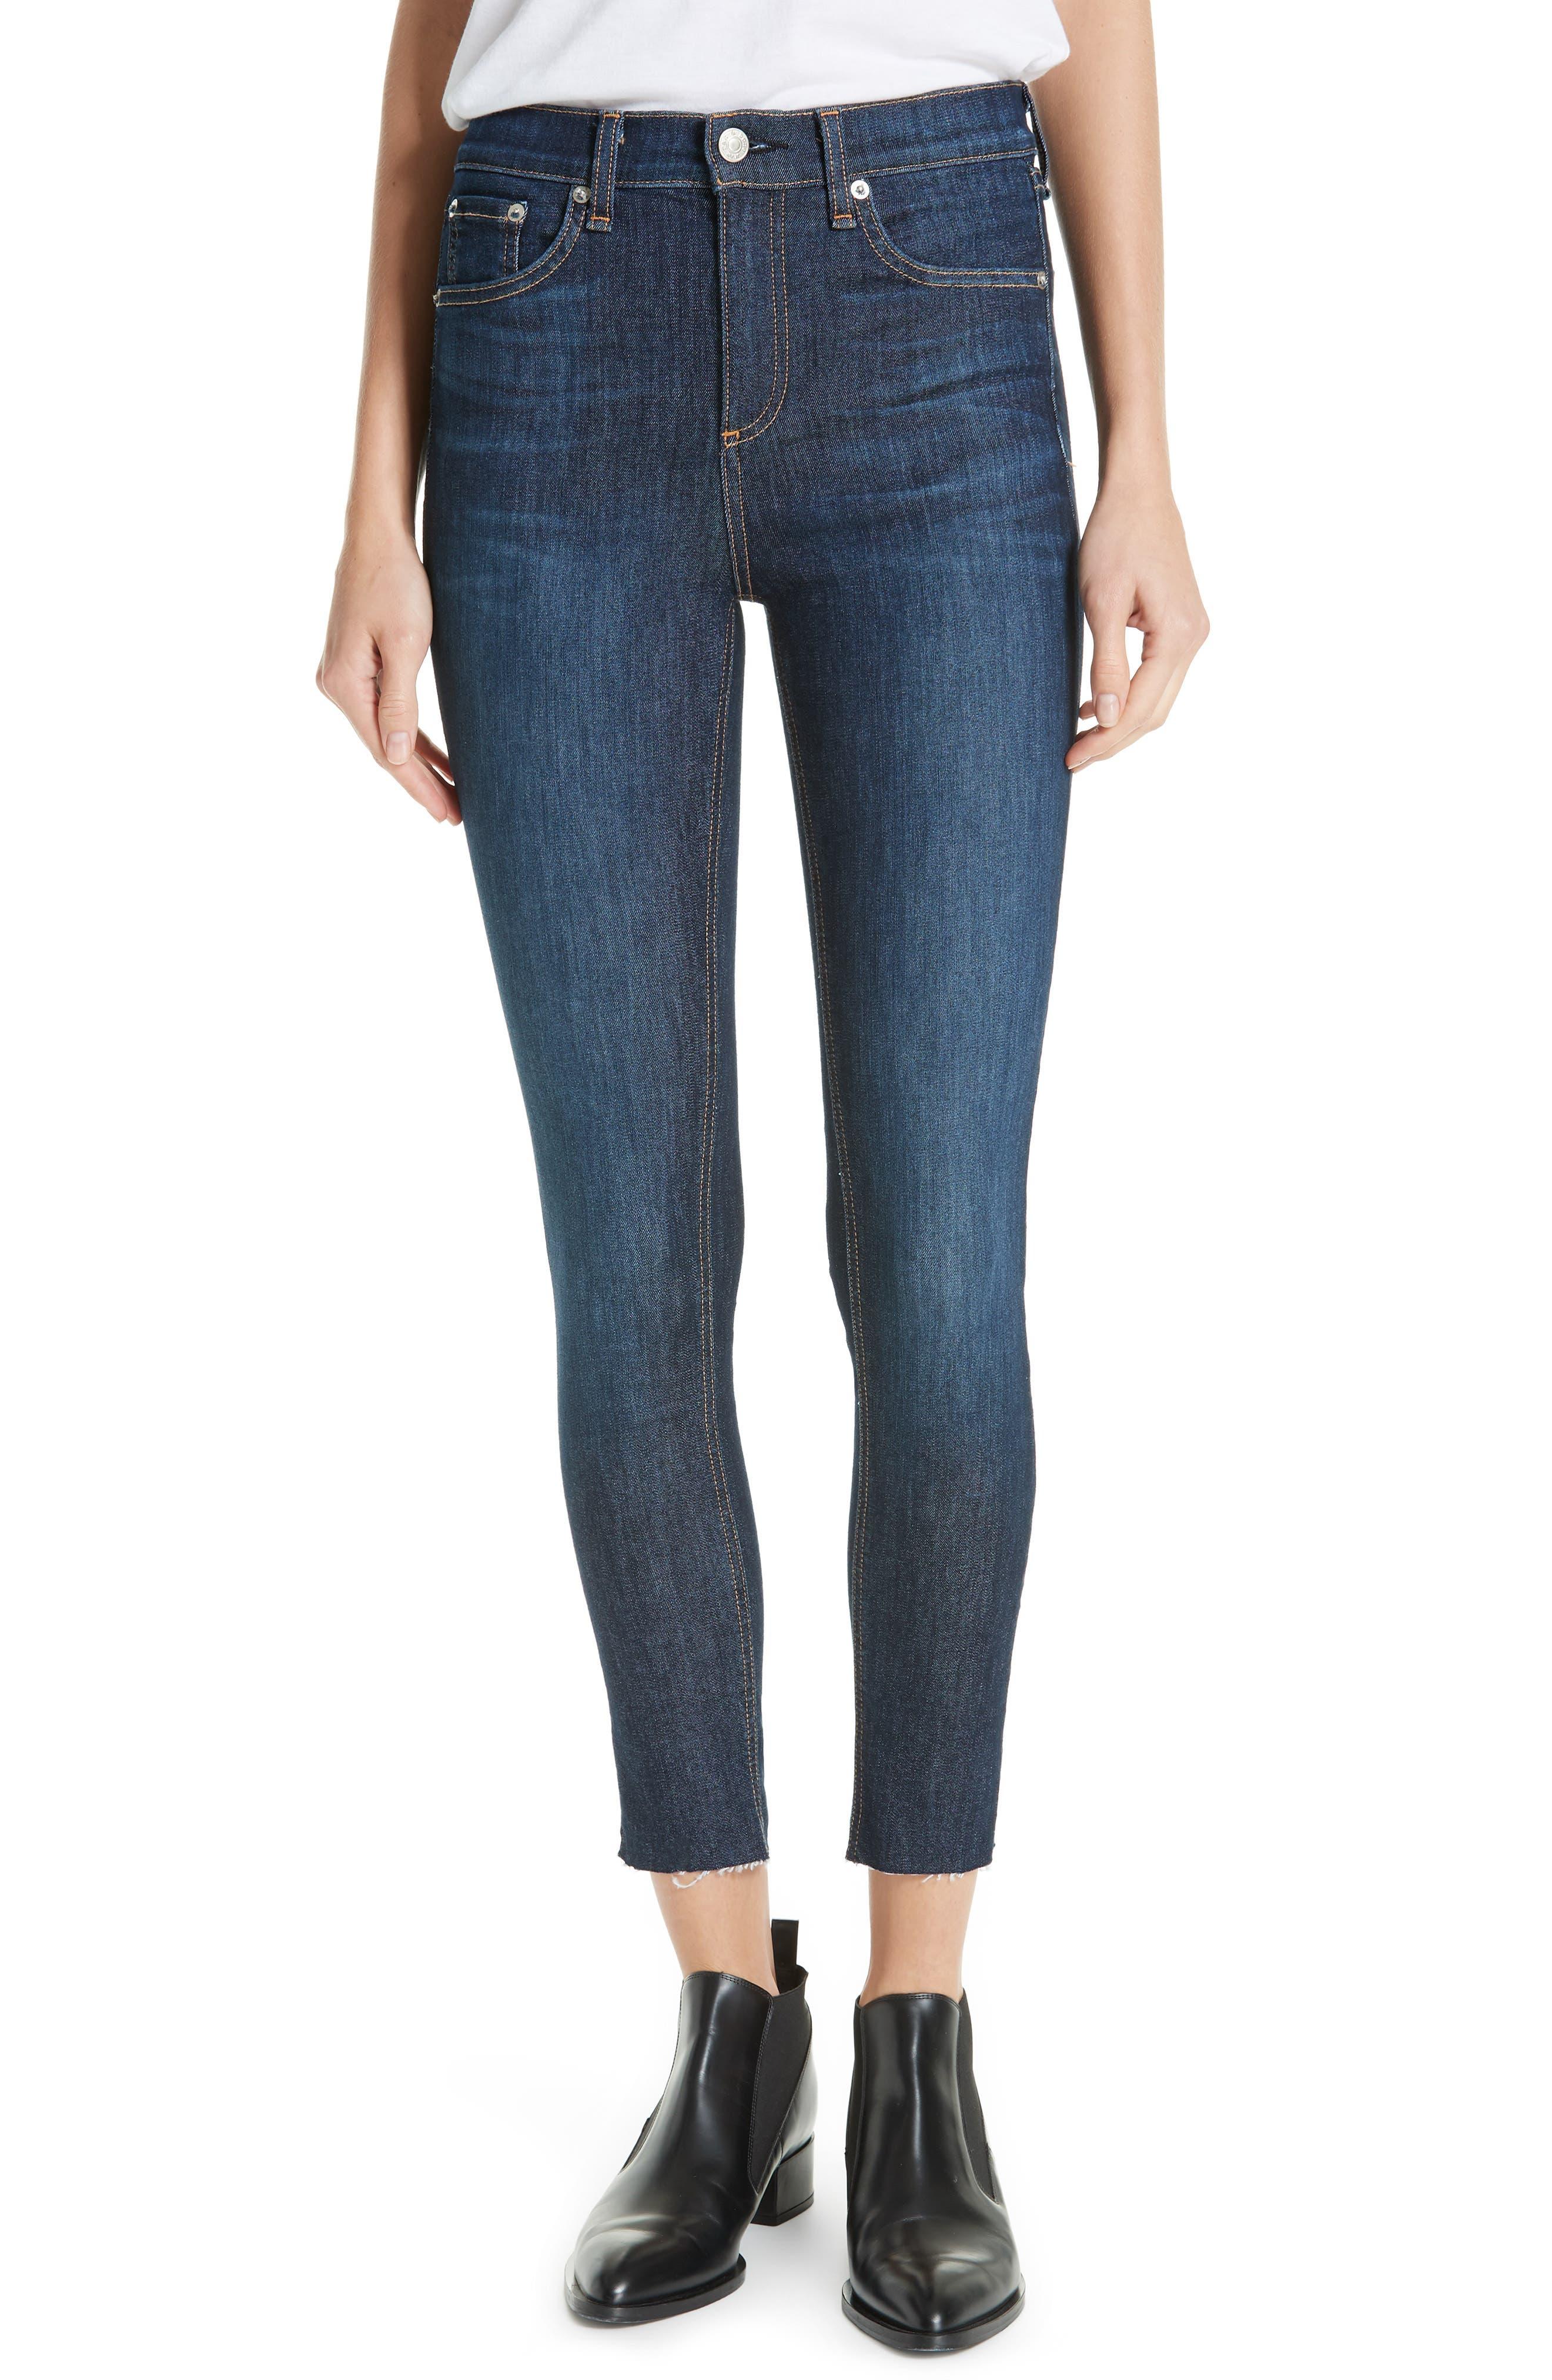 RAG & BONE, High Waist Skinny Ankle Jeans, Main thumbnail 1, color, 402